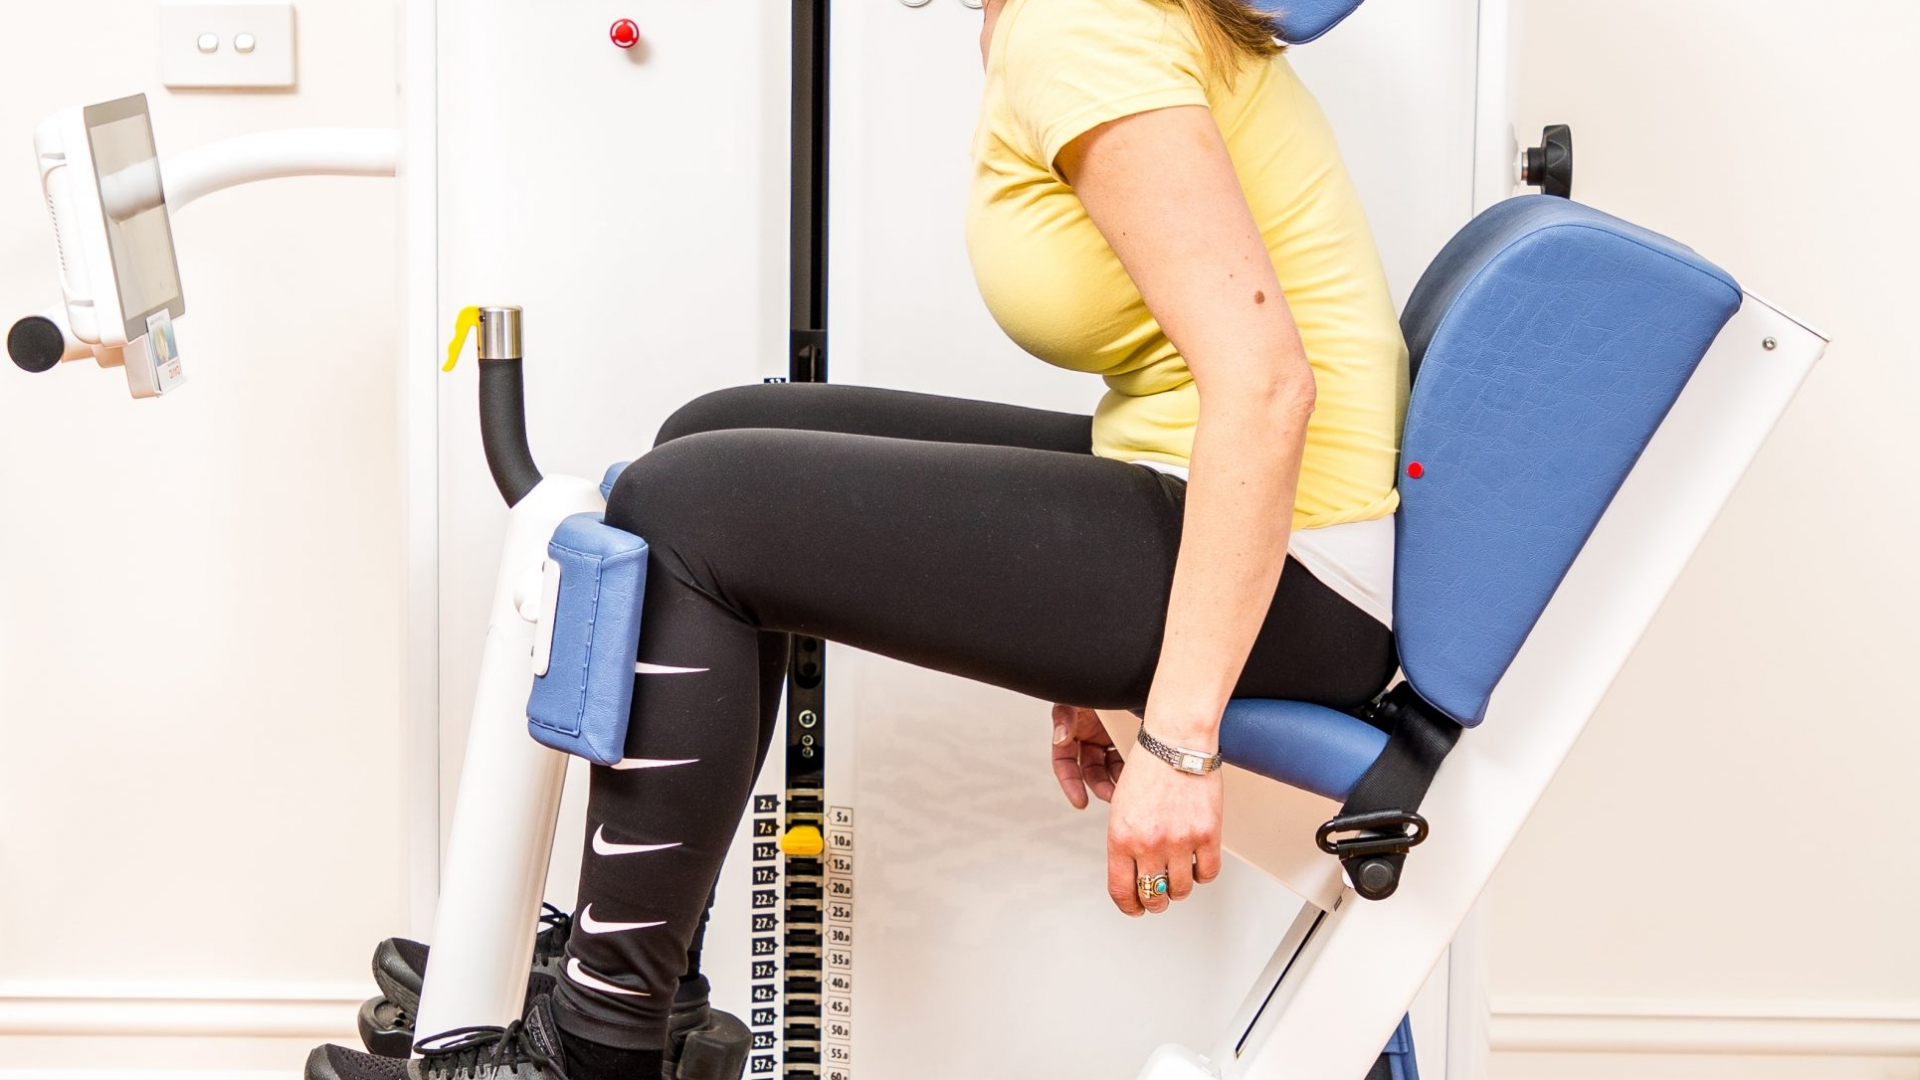 Workstrong_Physiotherapy_2020_credit_Mark_Gambino-5236